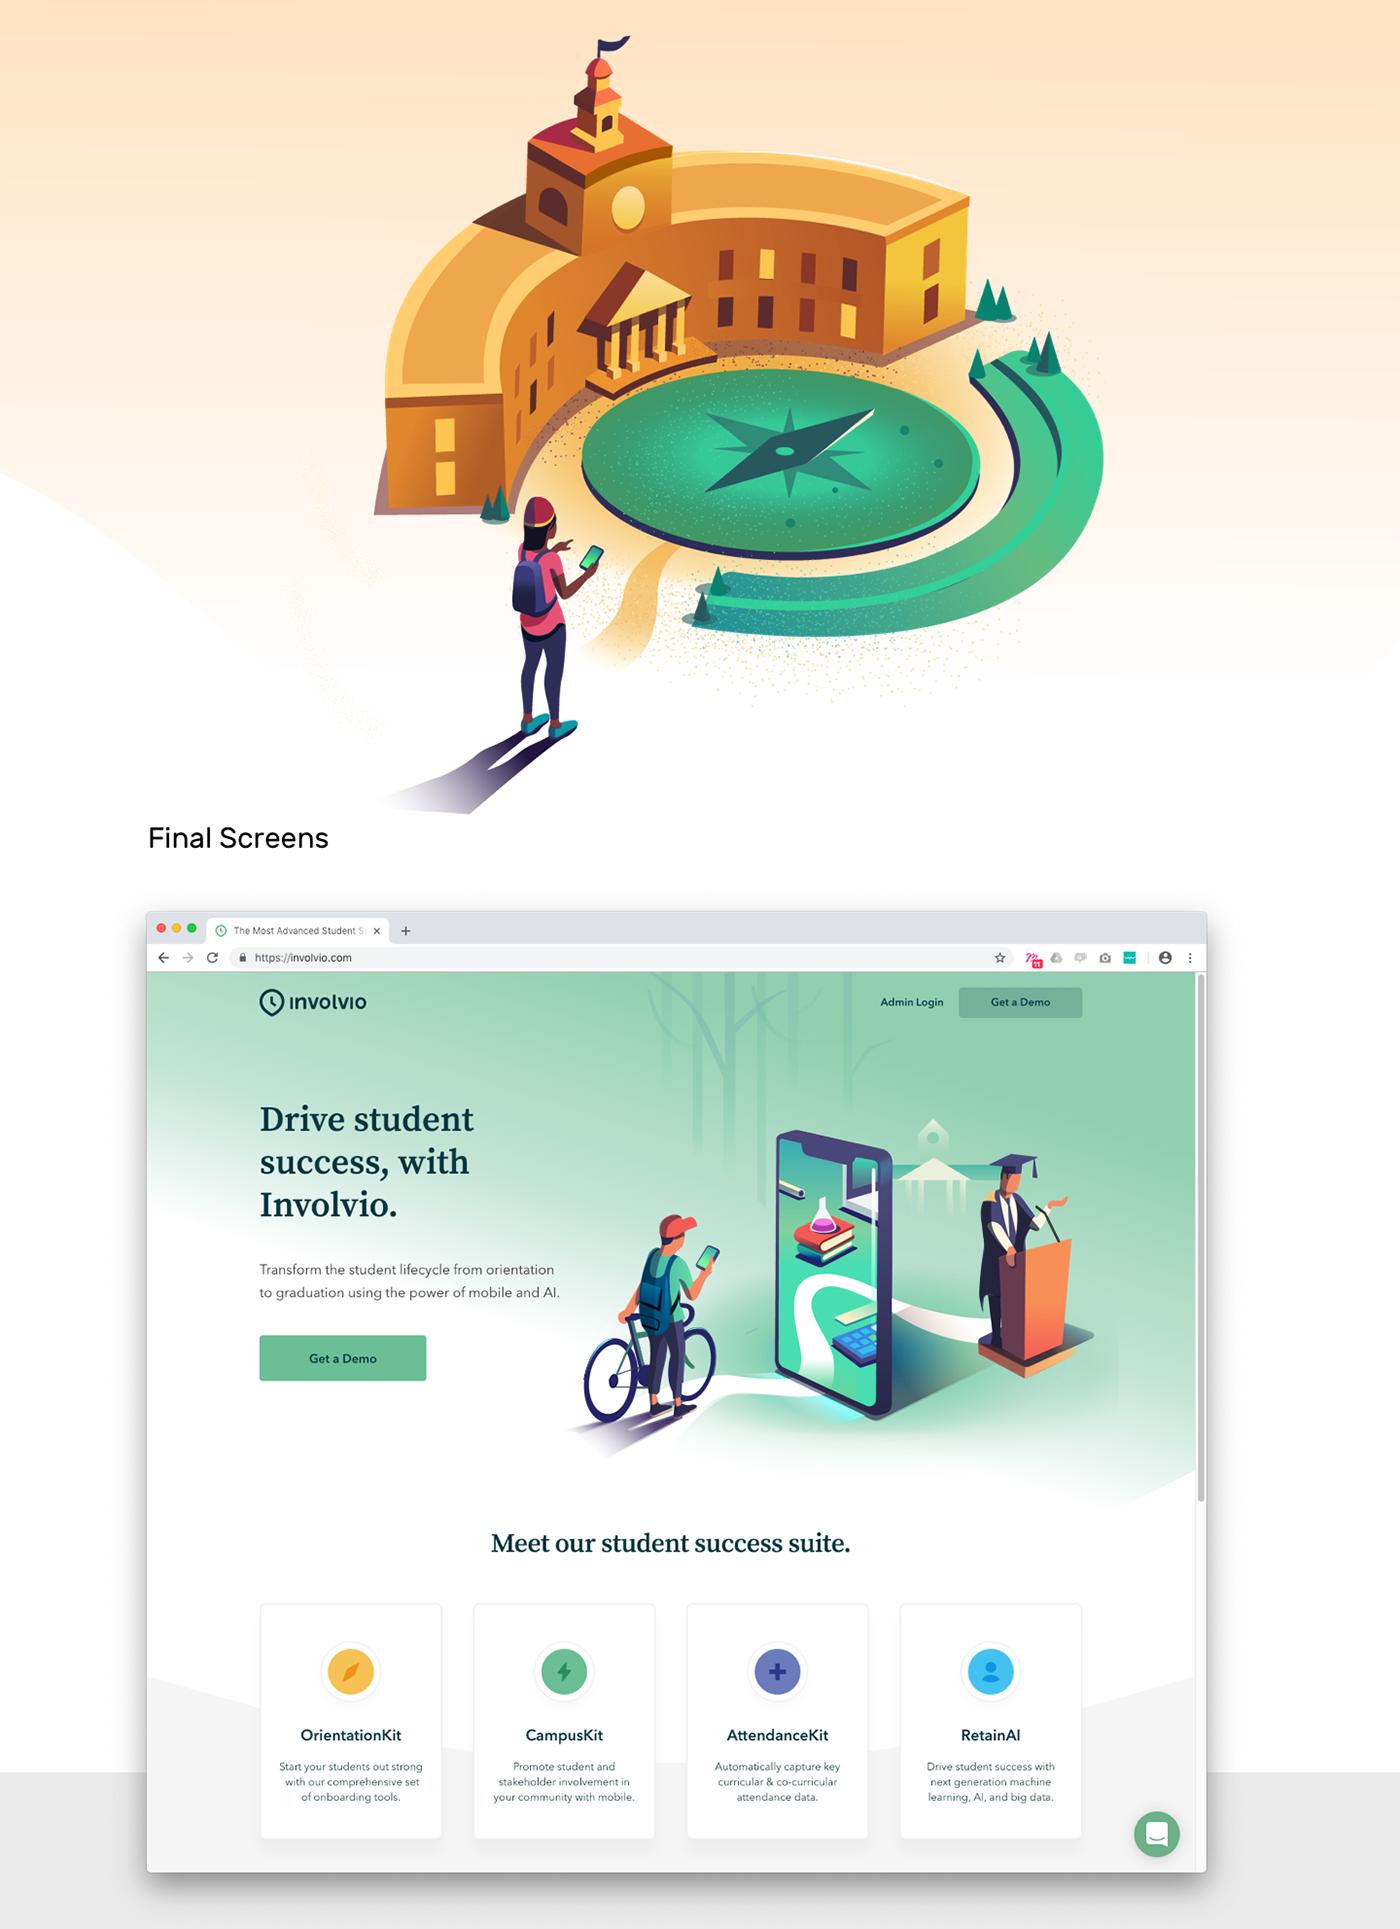 Collaboration ILLUSTRATION  motion design product illustration Story telling ux/ui visual design visual language Web Web Experience